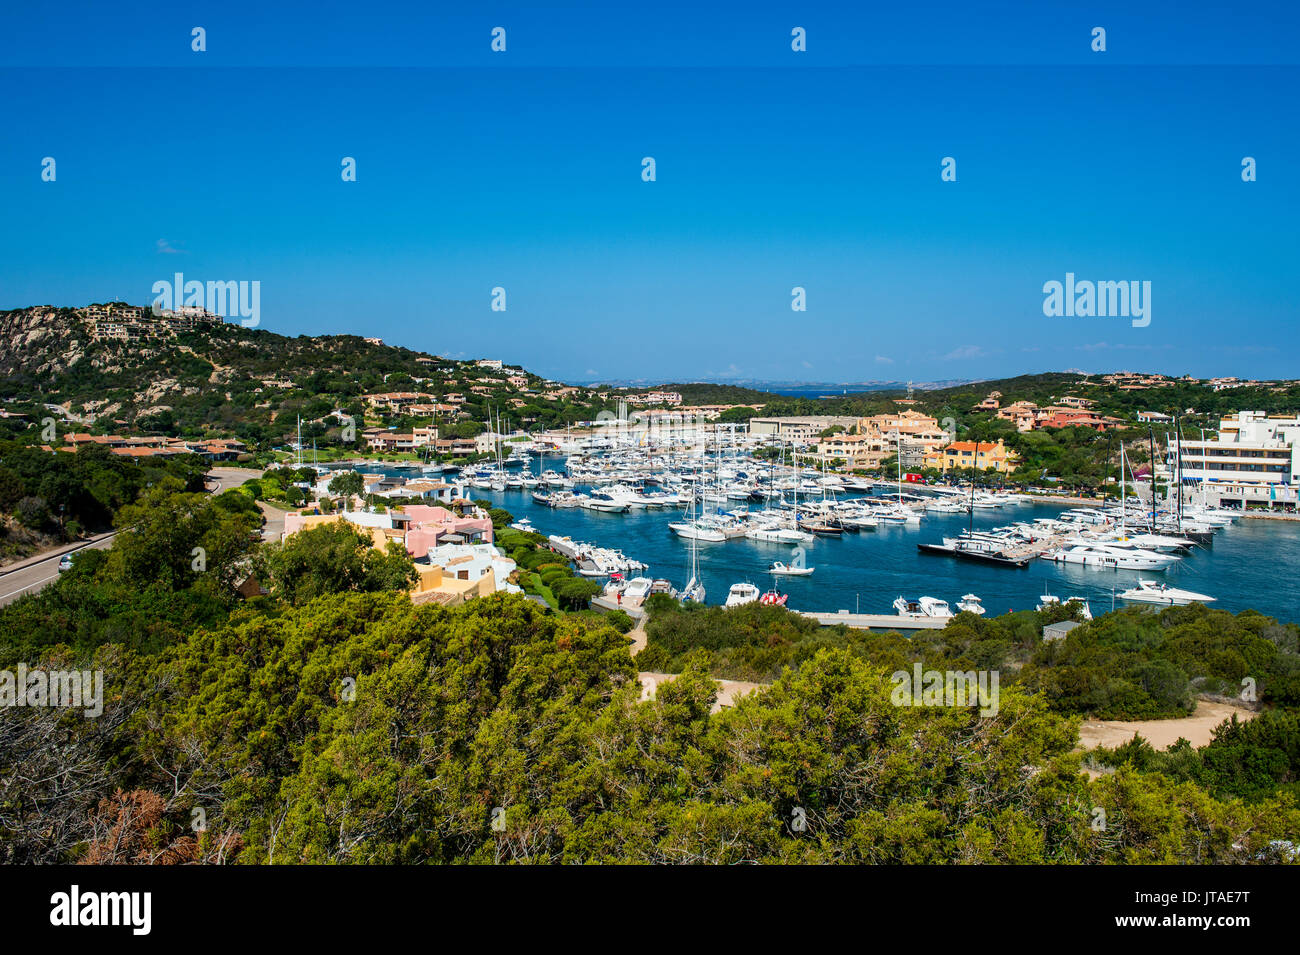 La baie de Porto Cervo, Costa Smeralda, Sardaigne, Italie, Méditerranée, Europe Photo Stock